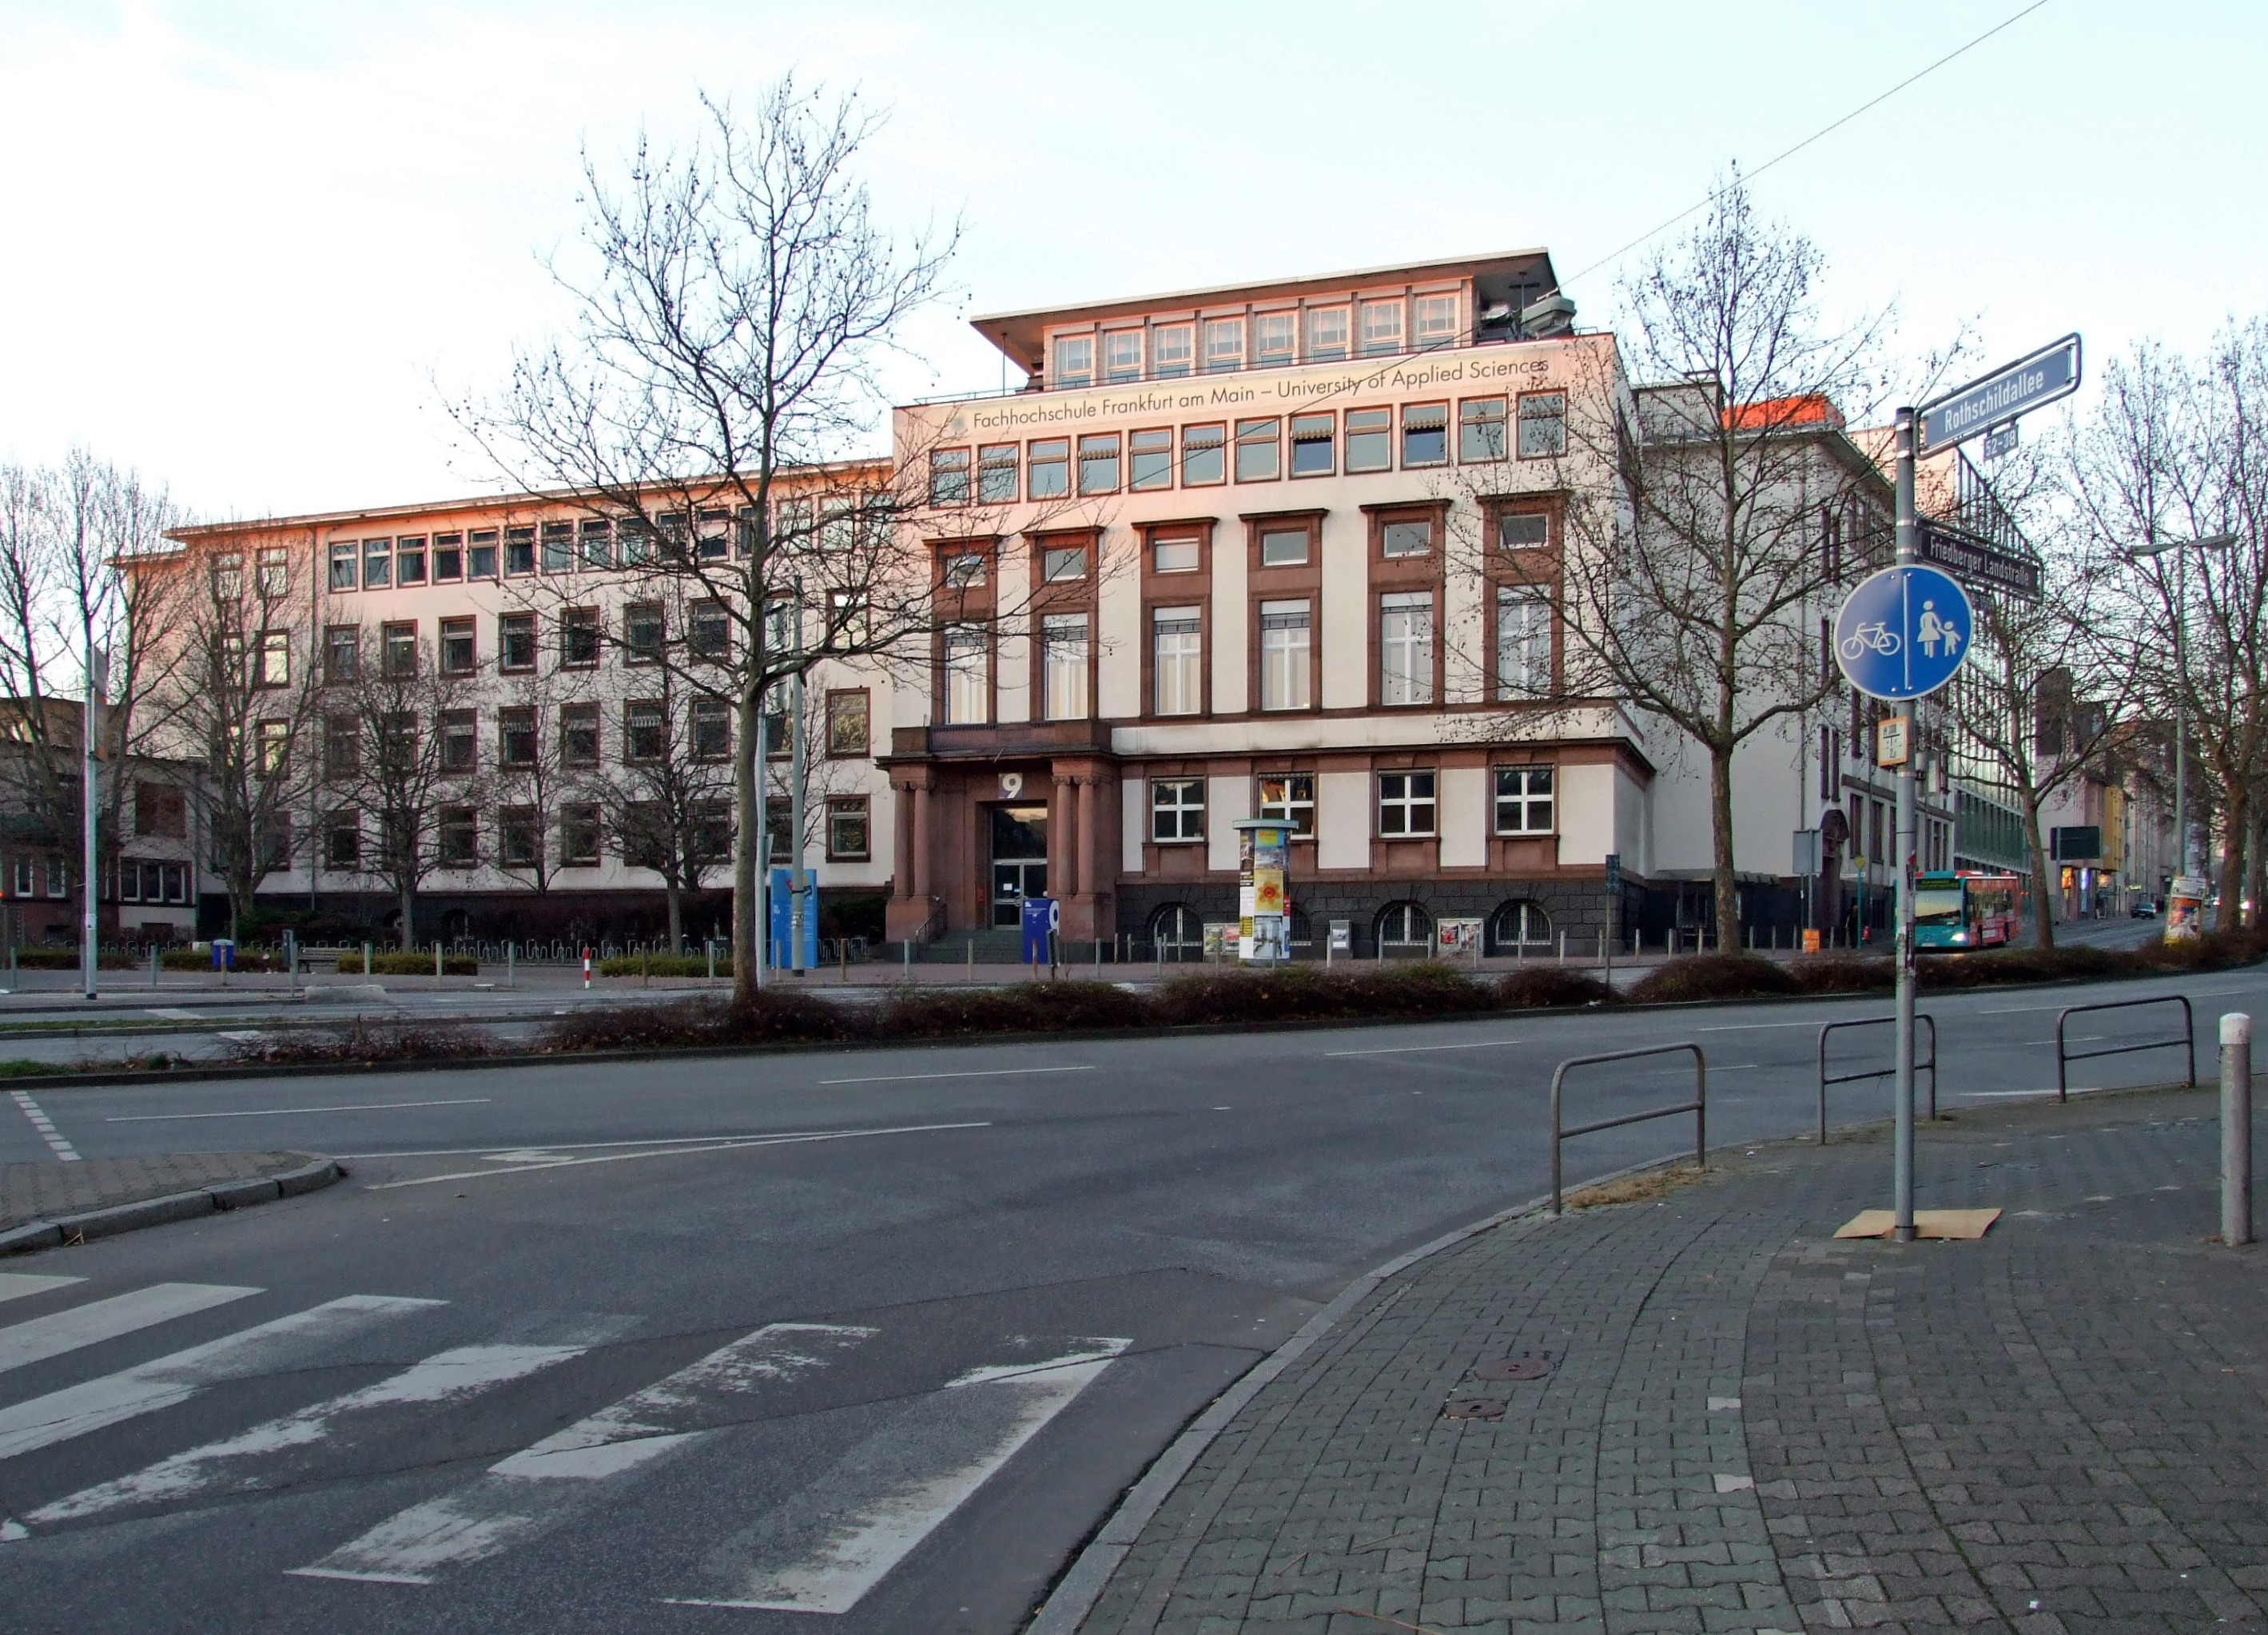 Cafe Fh Frankfurt